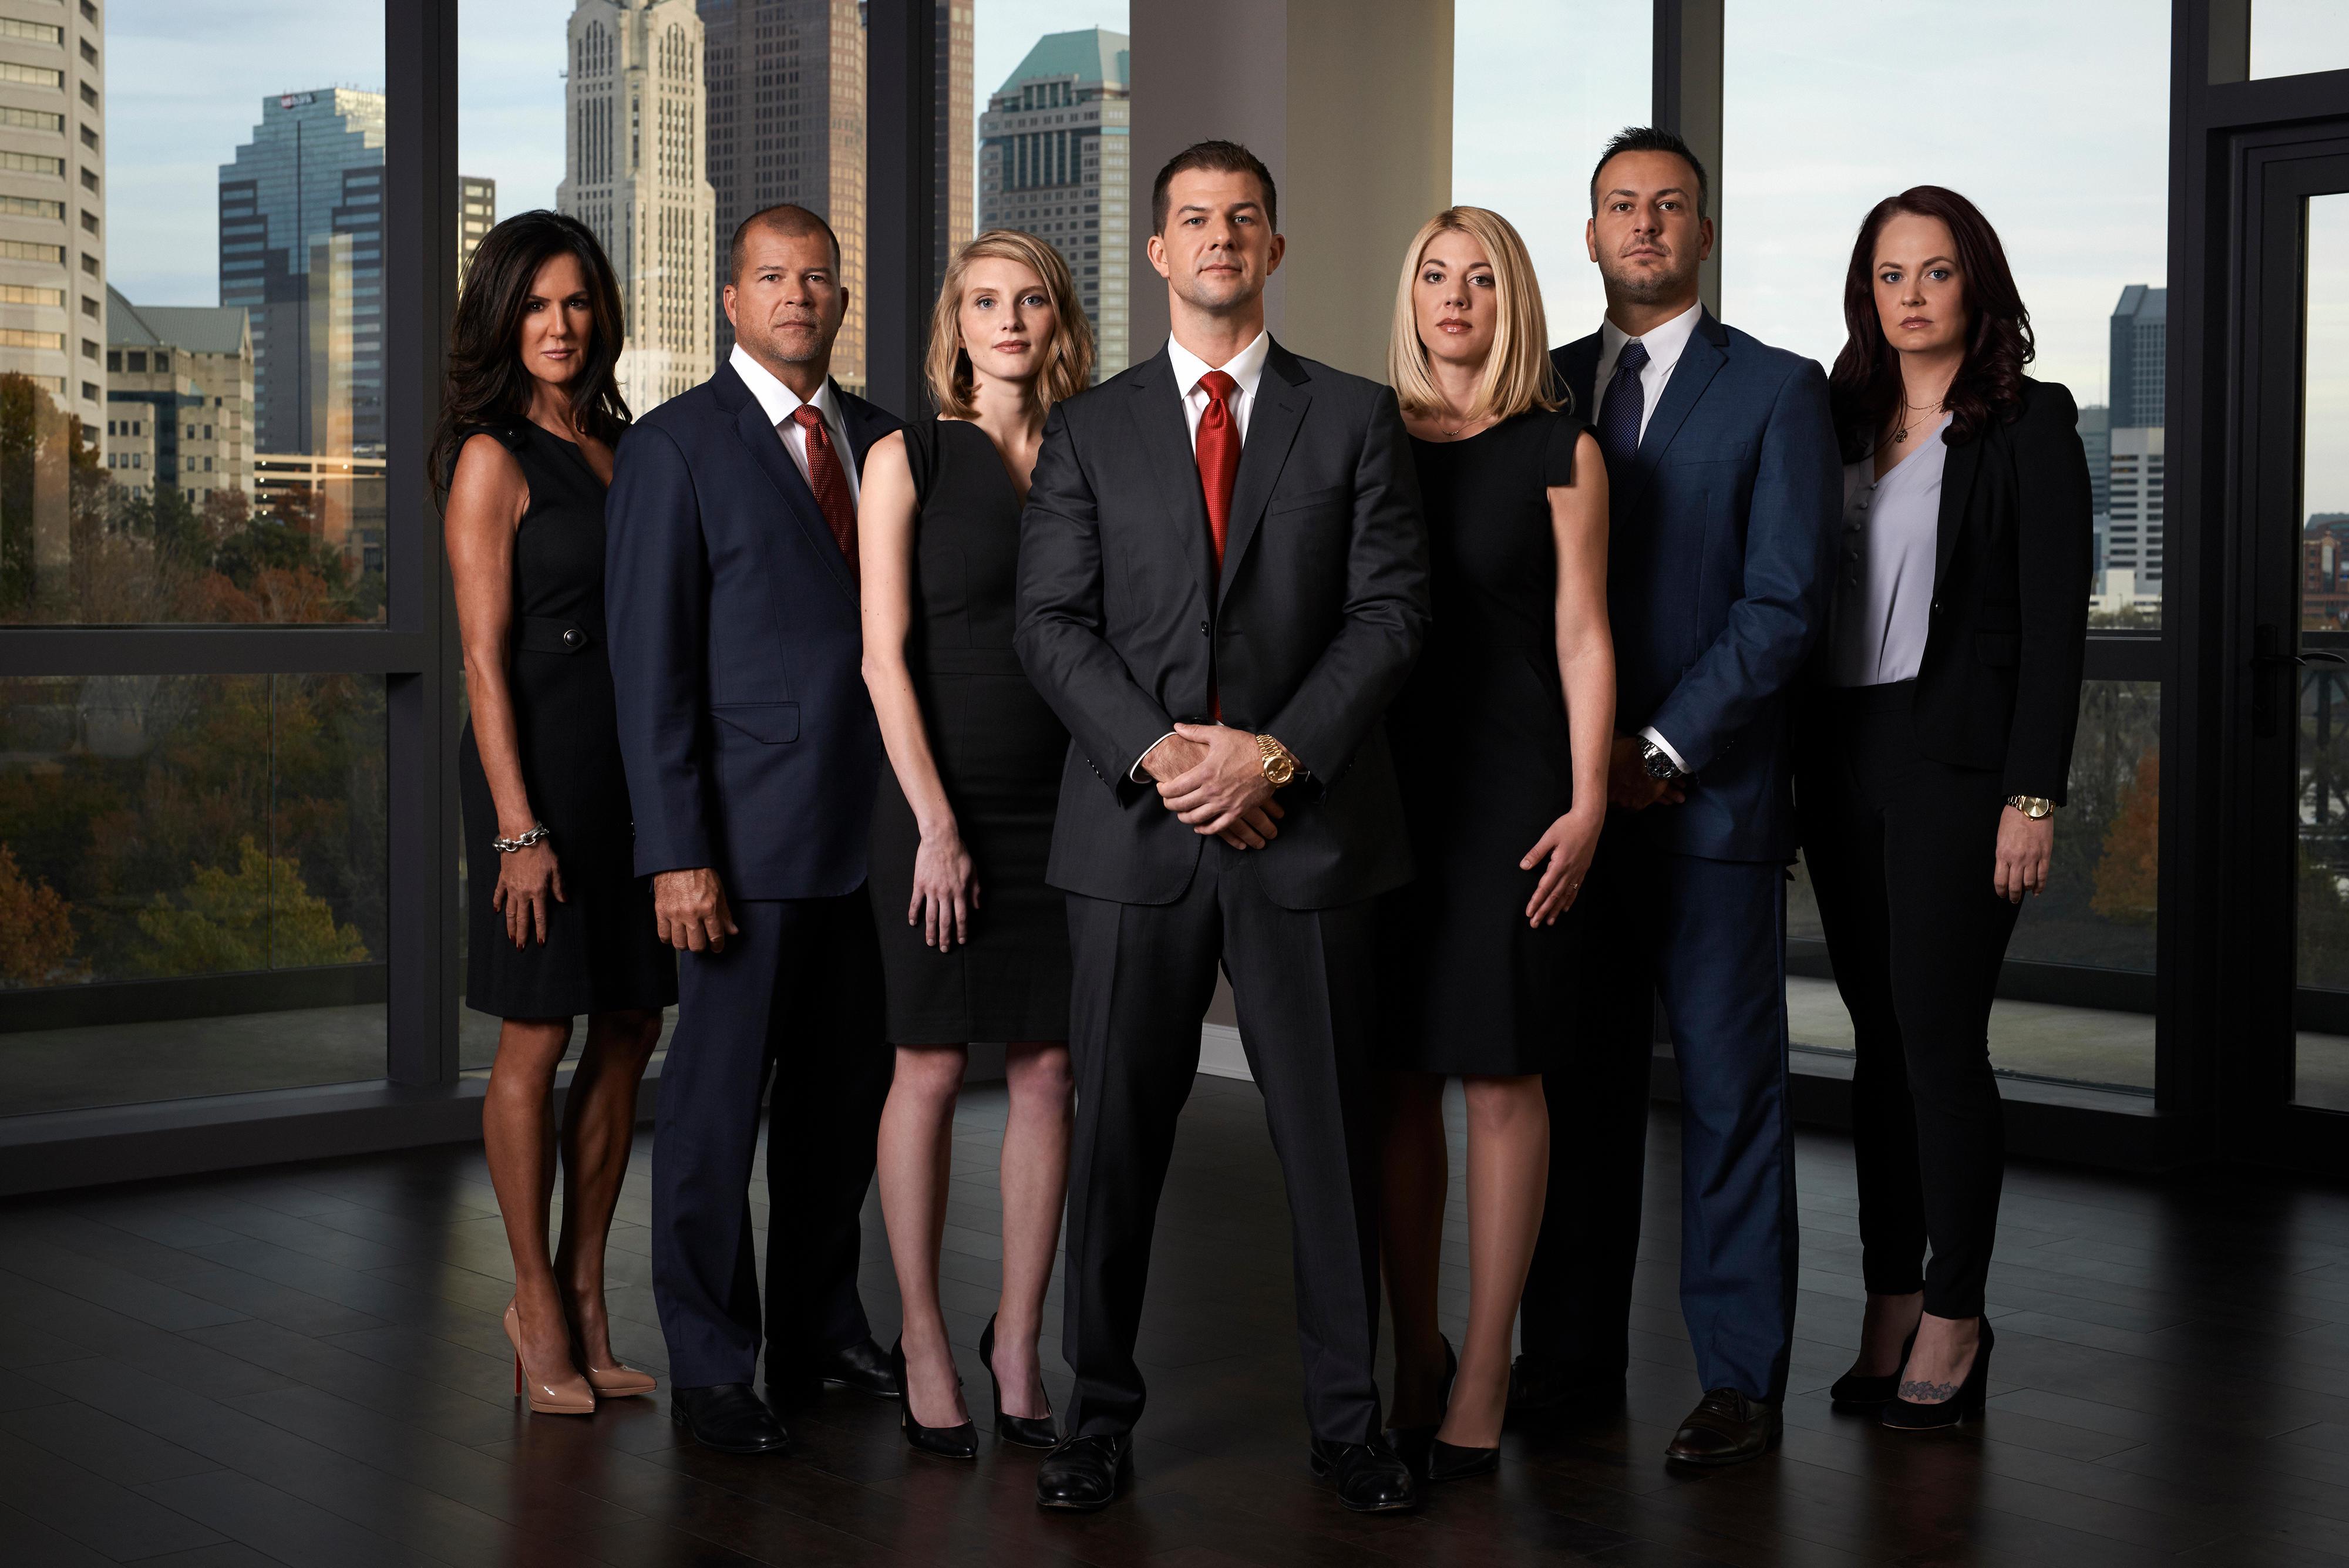 Dayton OH joslyn law firm